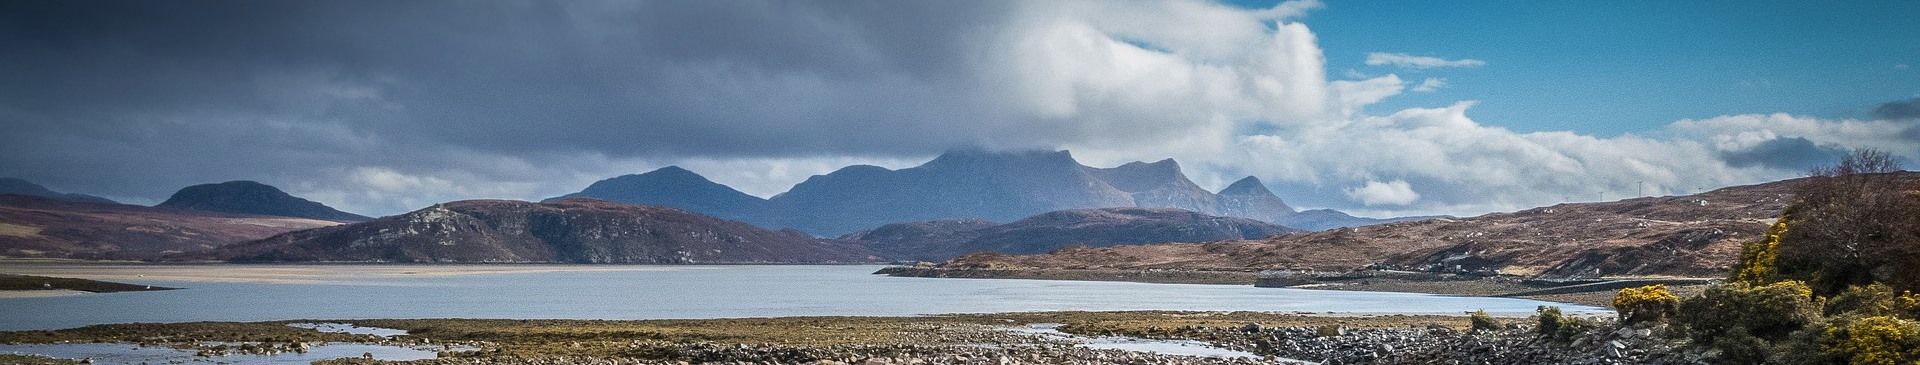 scotland-2834764_1920 (1)